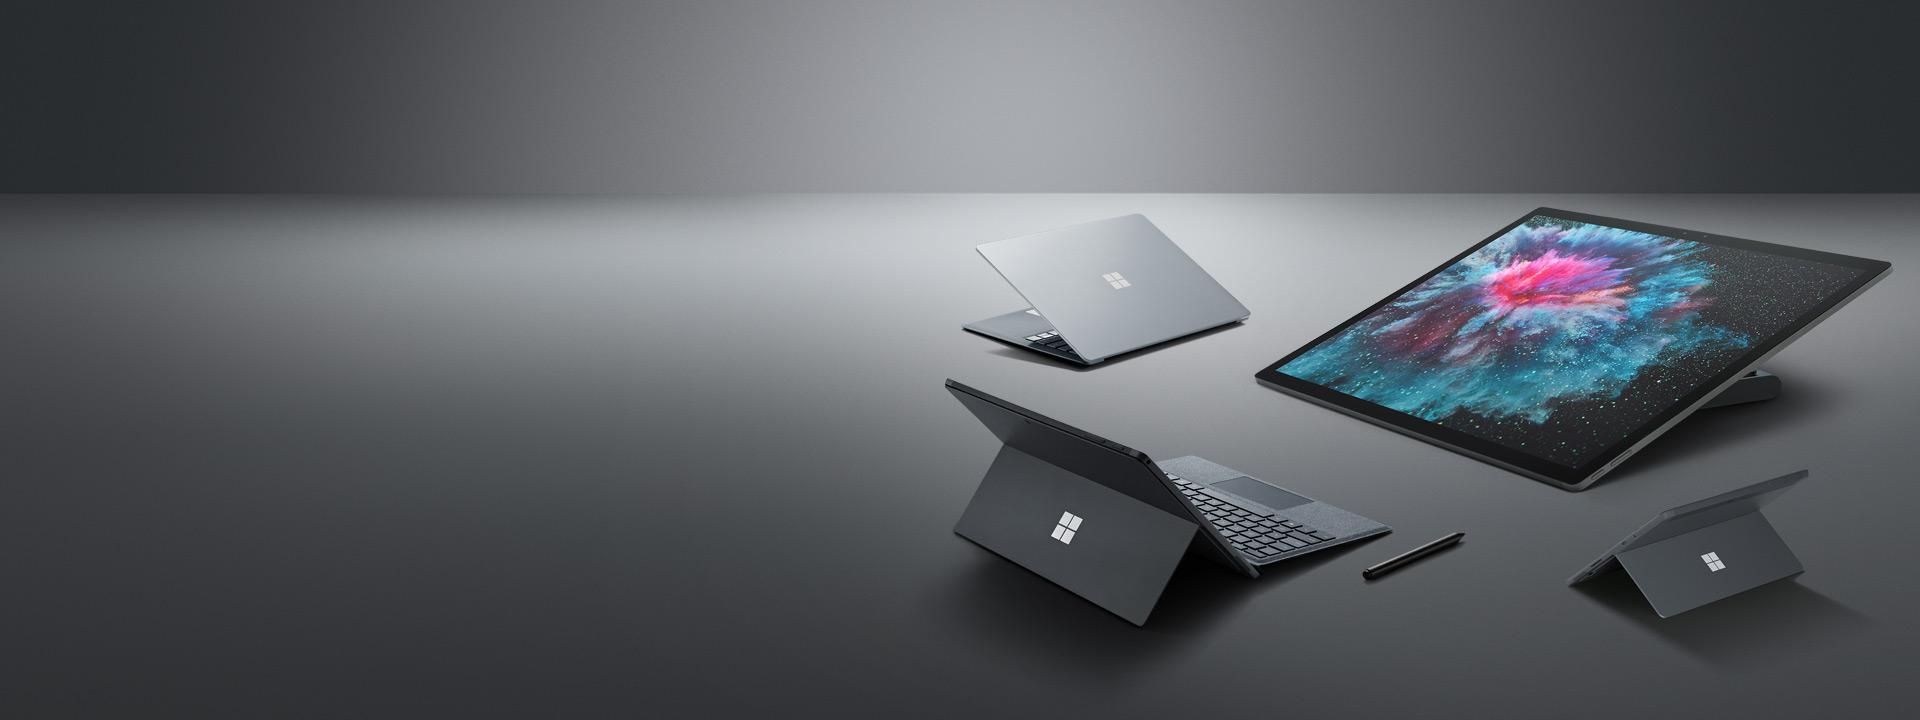 Surface Laptop 2، Surface Pro 6، Surface Go، Surface Studio 2